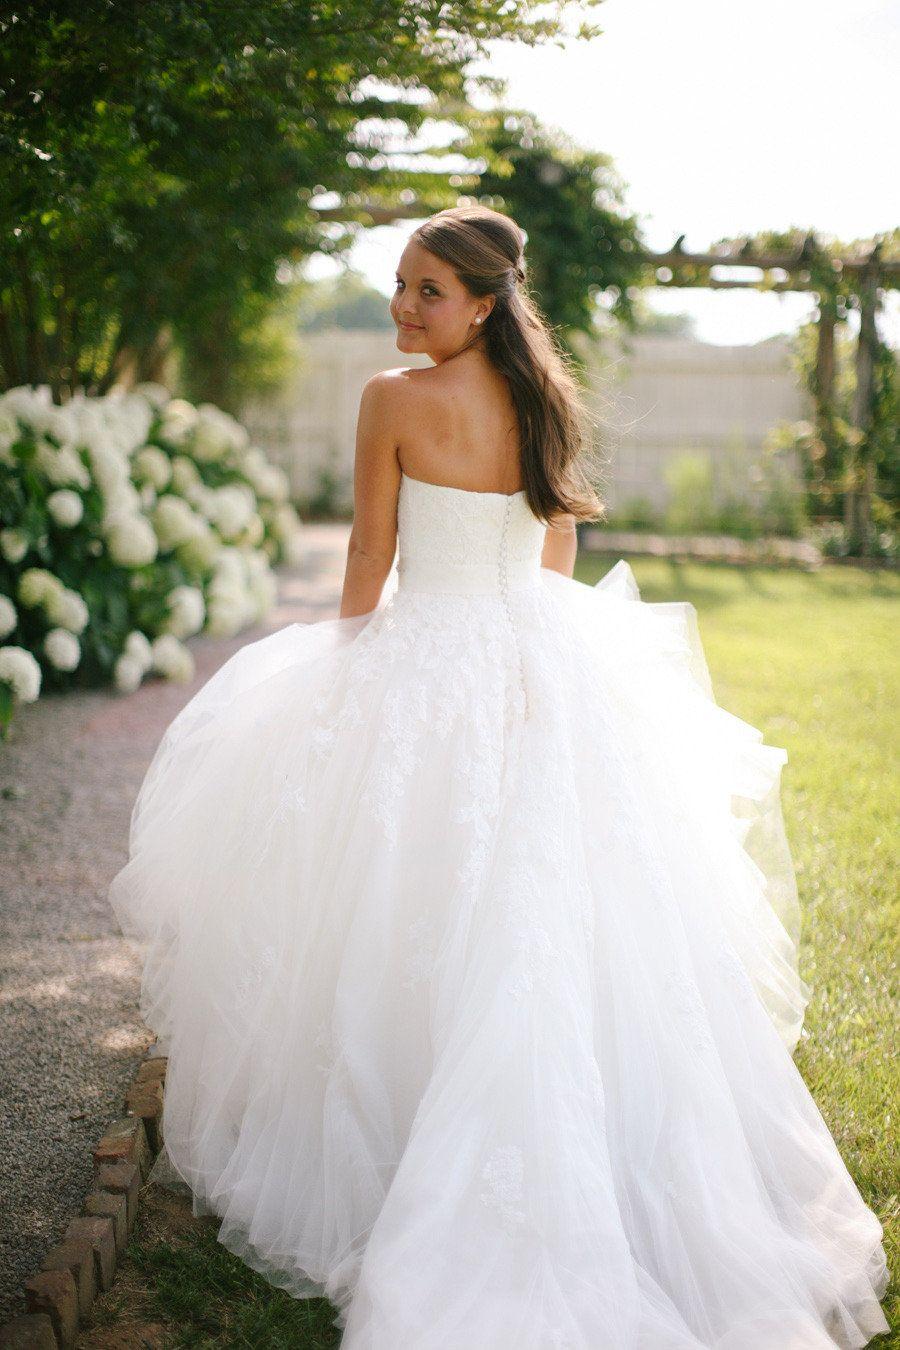 Nashville Wedding by Smitten Photography + H Three Events